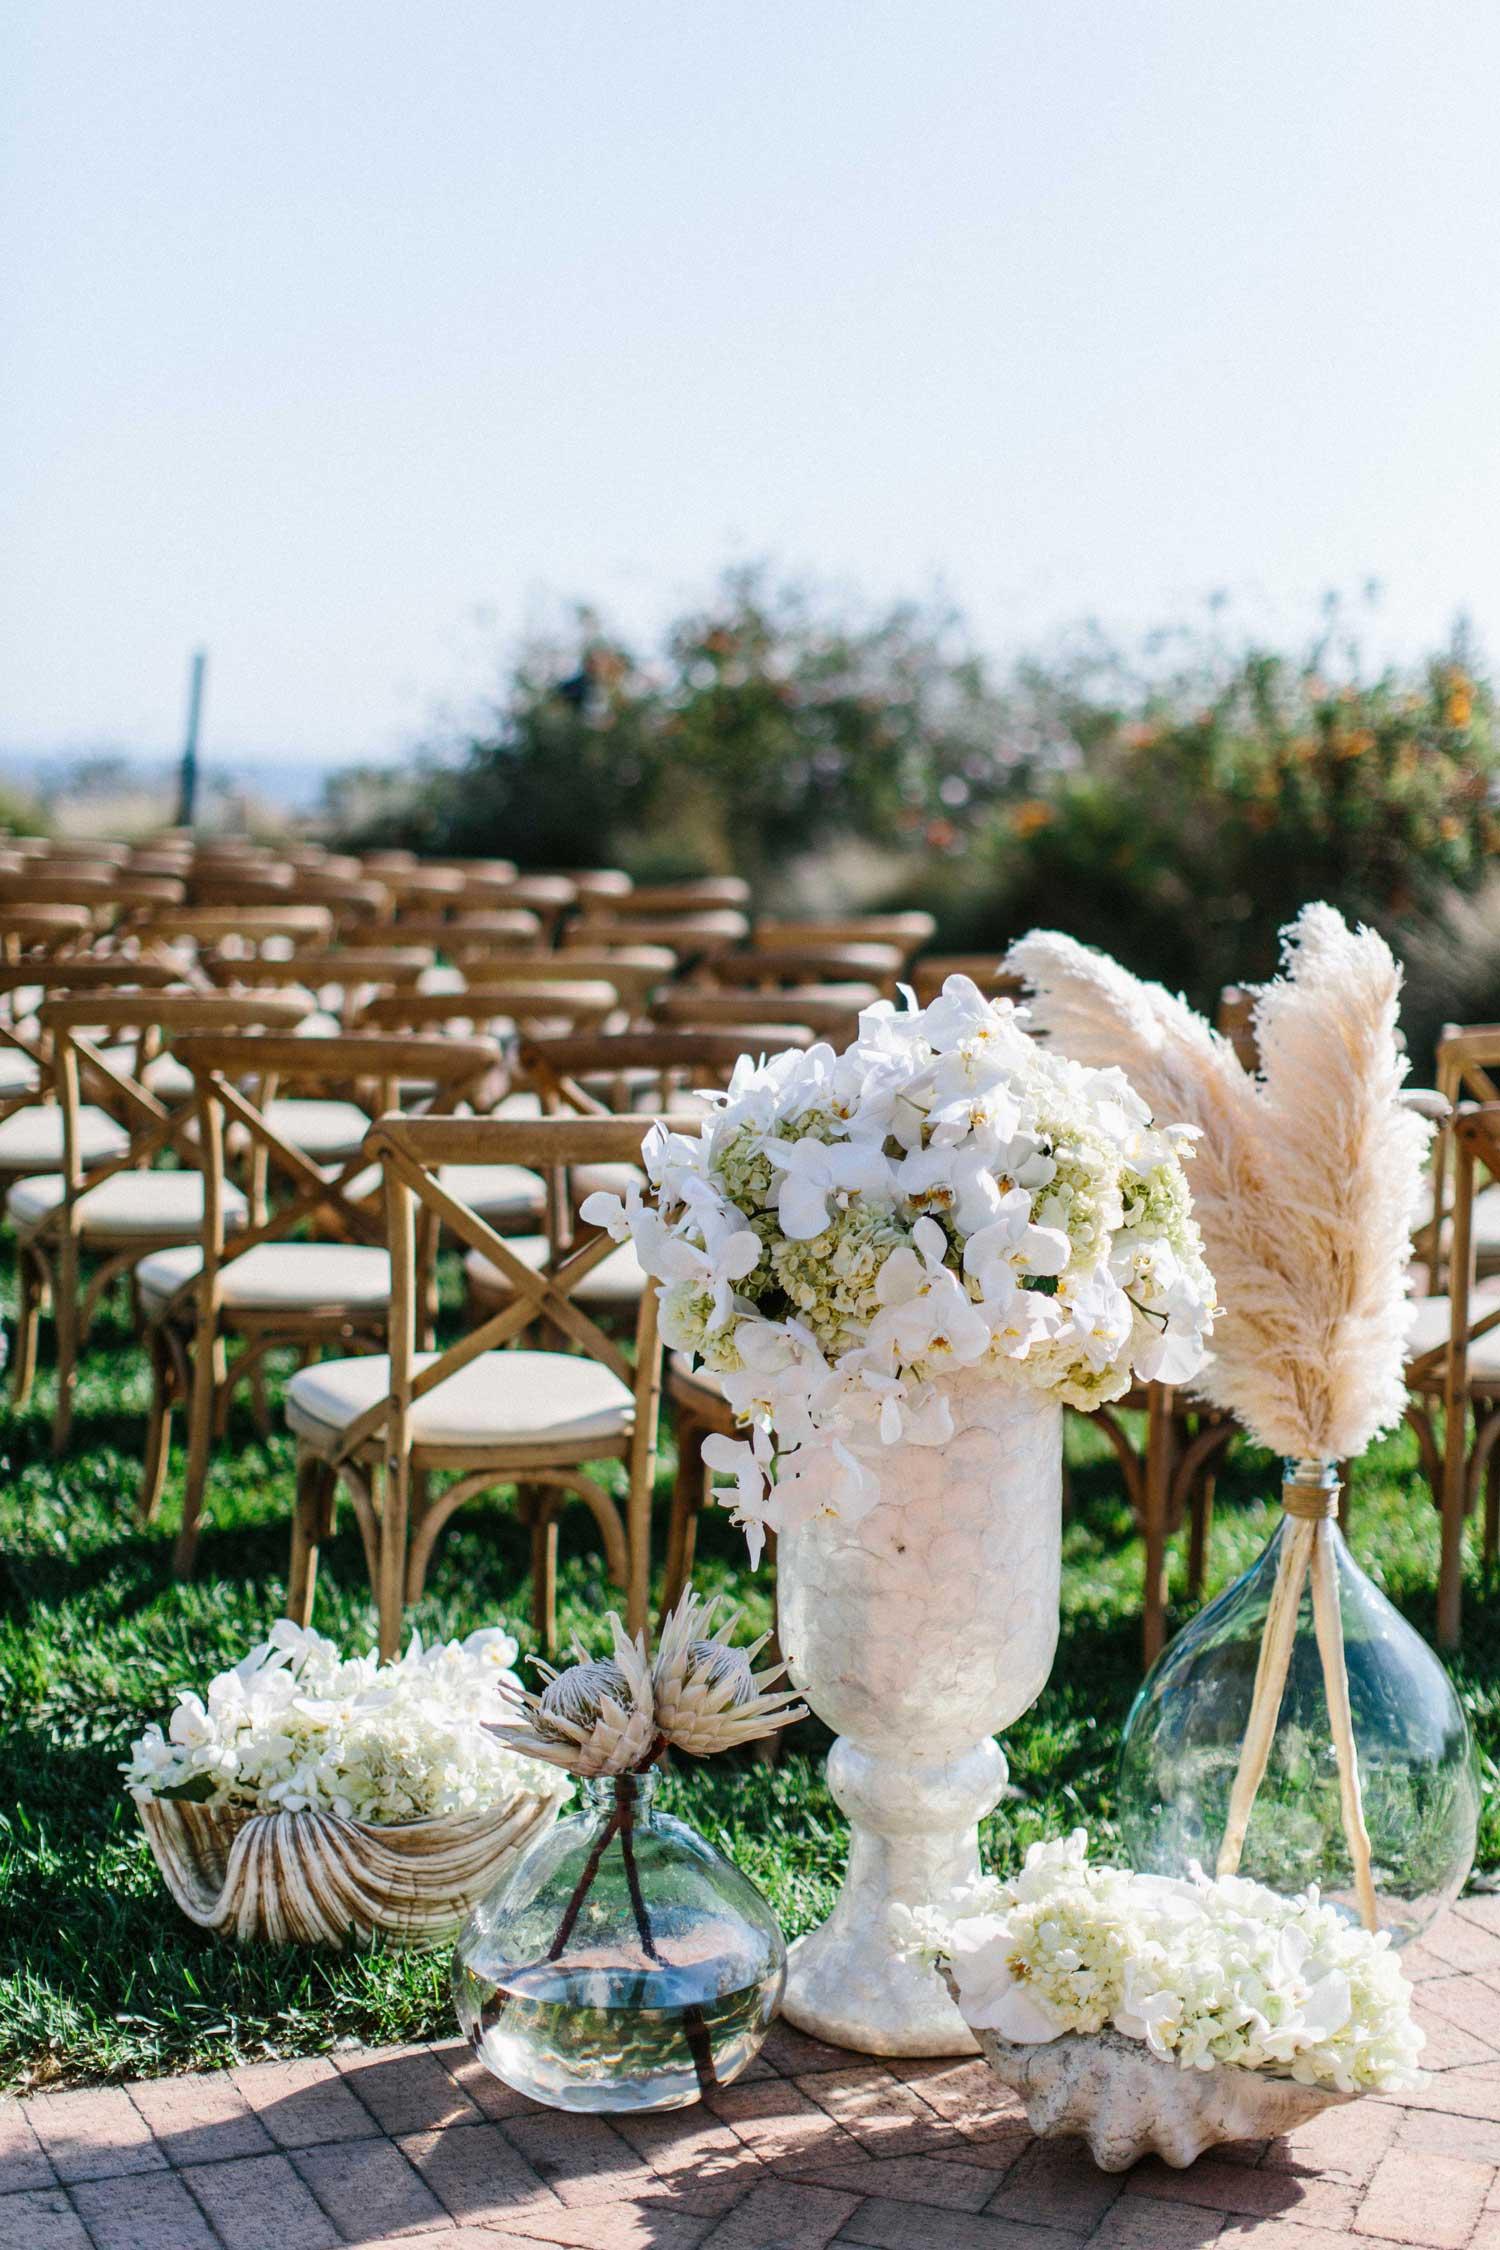 wedding ceremony decorations protea flower in glass vase